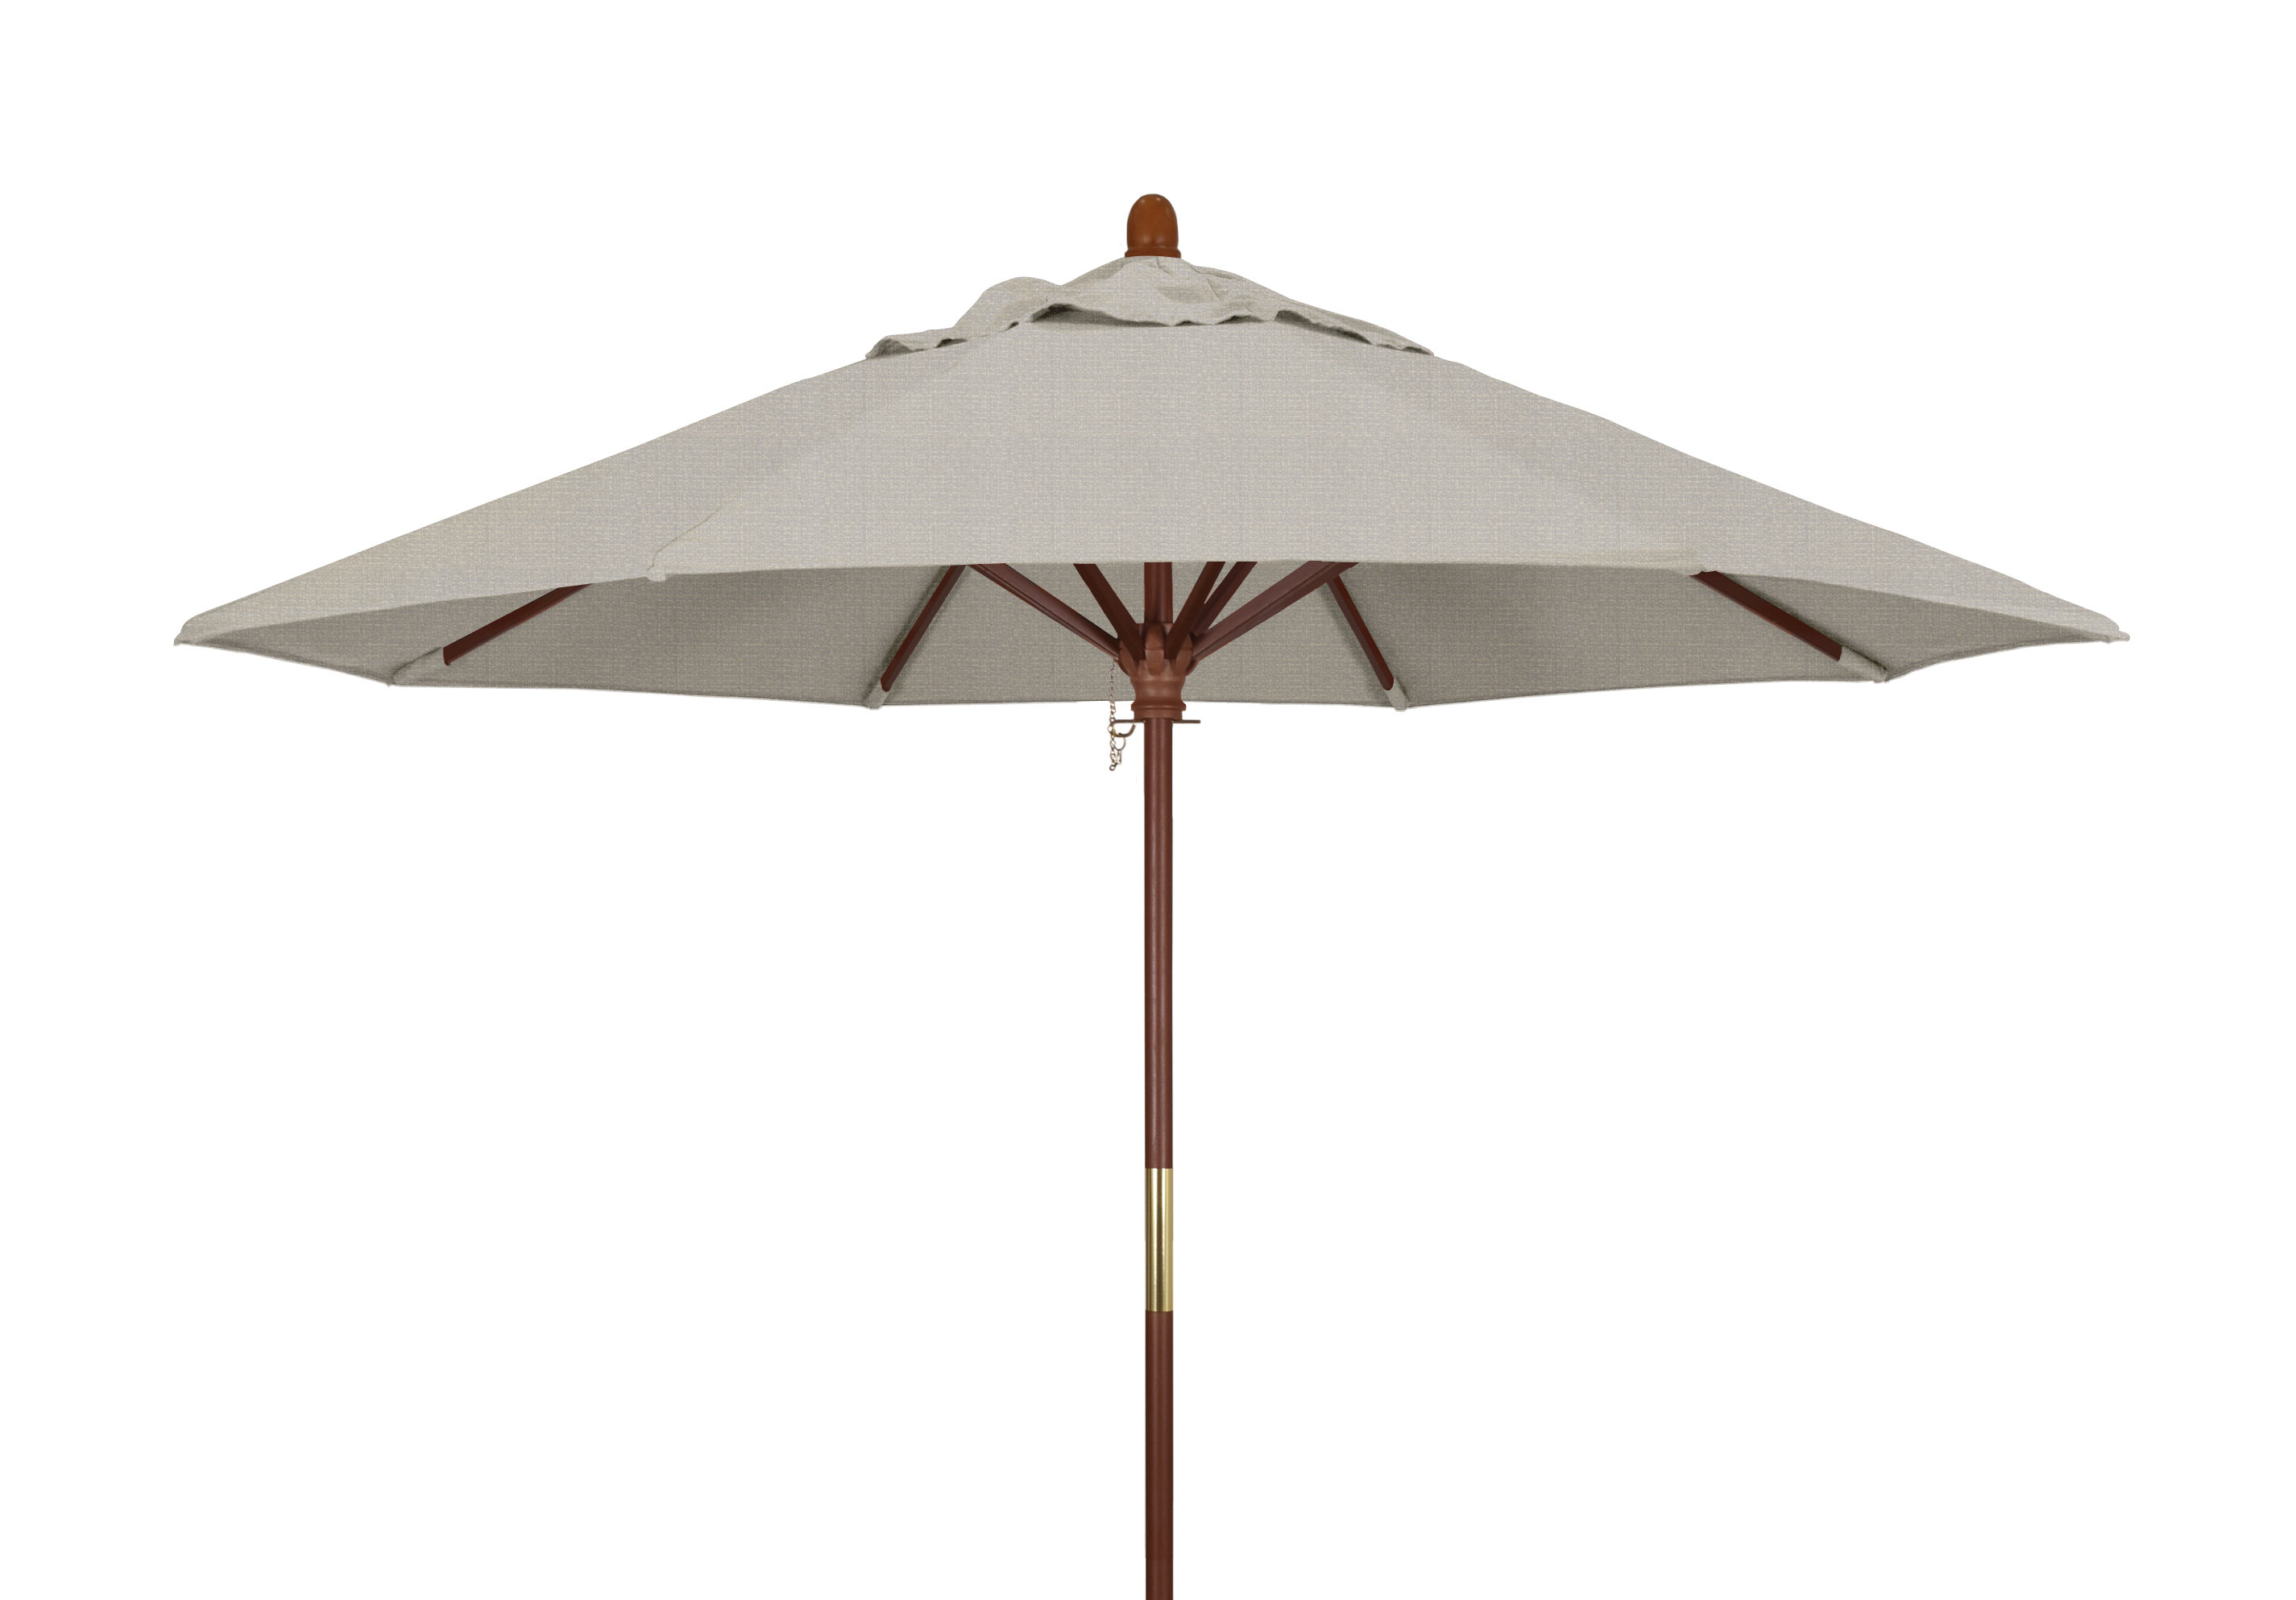 Mraz 9' Market Umbrella With Regard To Newest Mraz Market Umbrellas (Gallery 4 of 20)